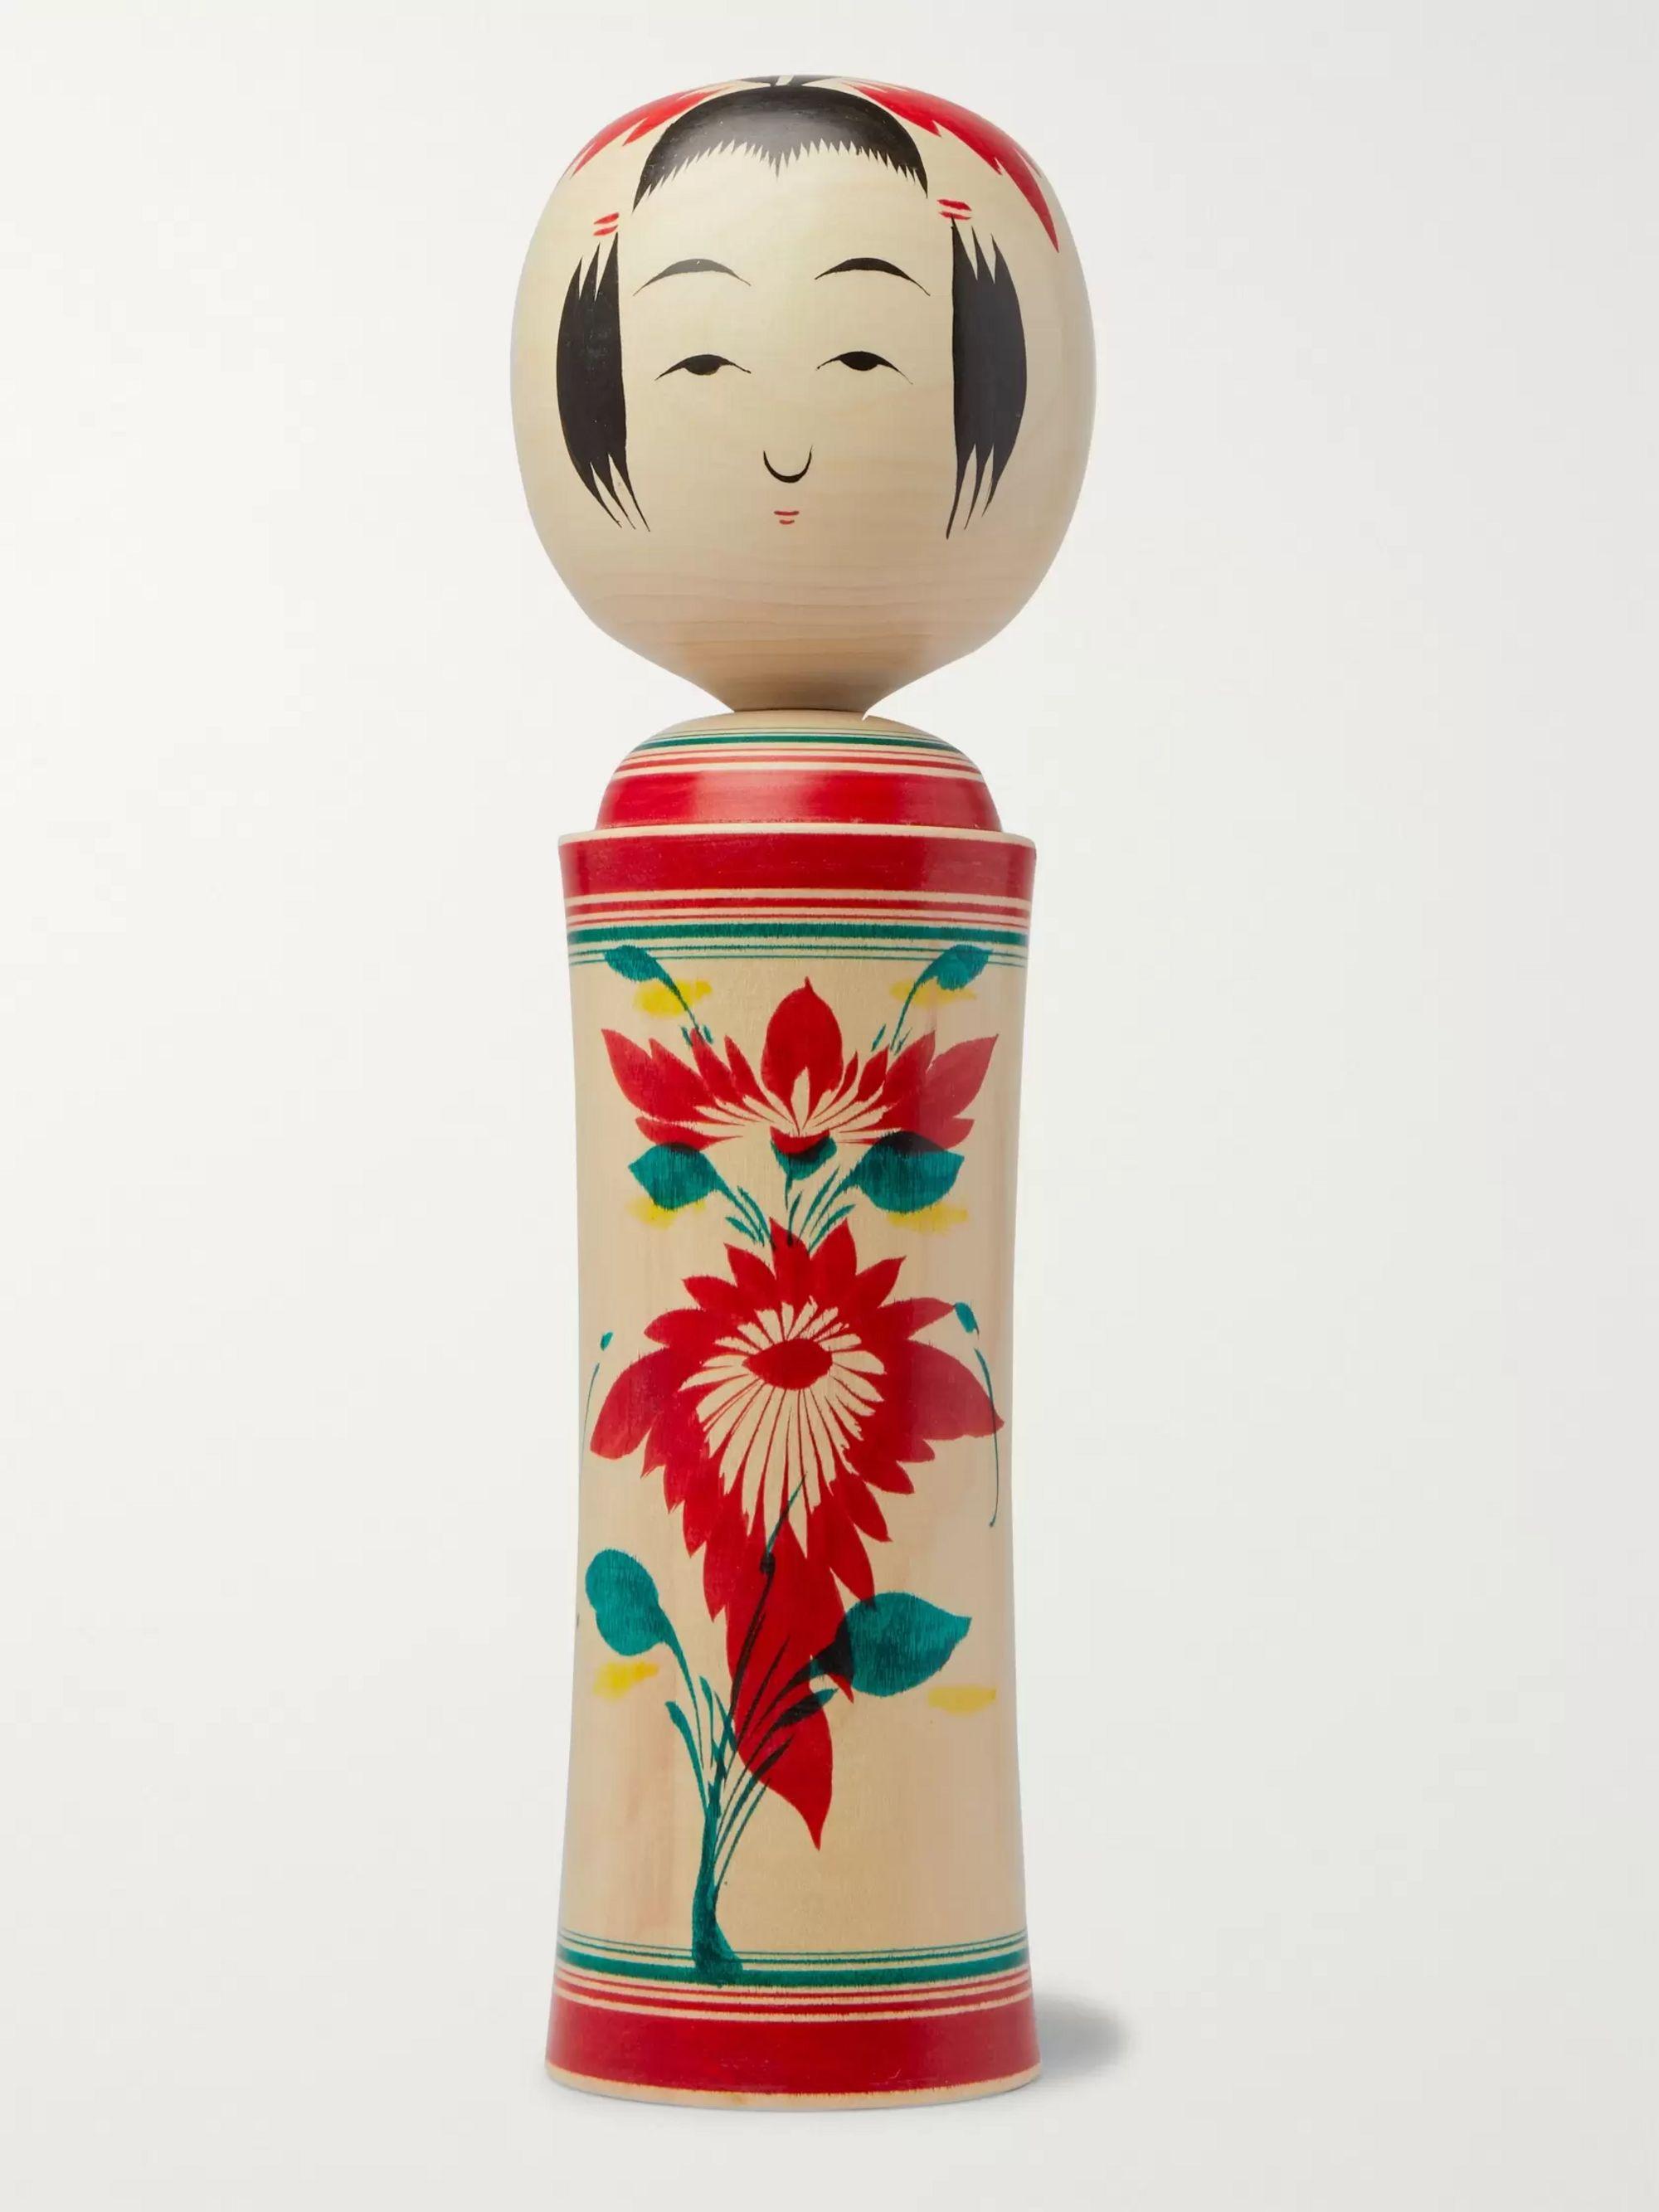 Vintage Japanese Kokeshi Doll B10a - SMALL - Mustard Vintage